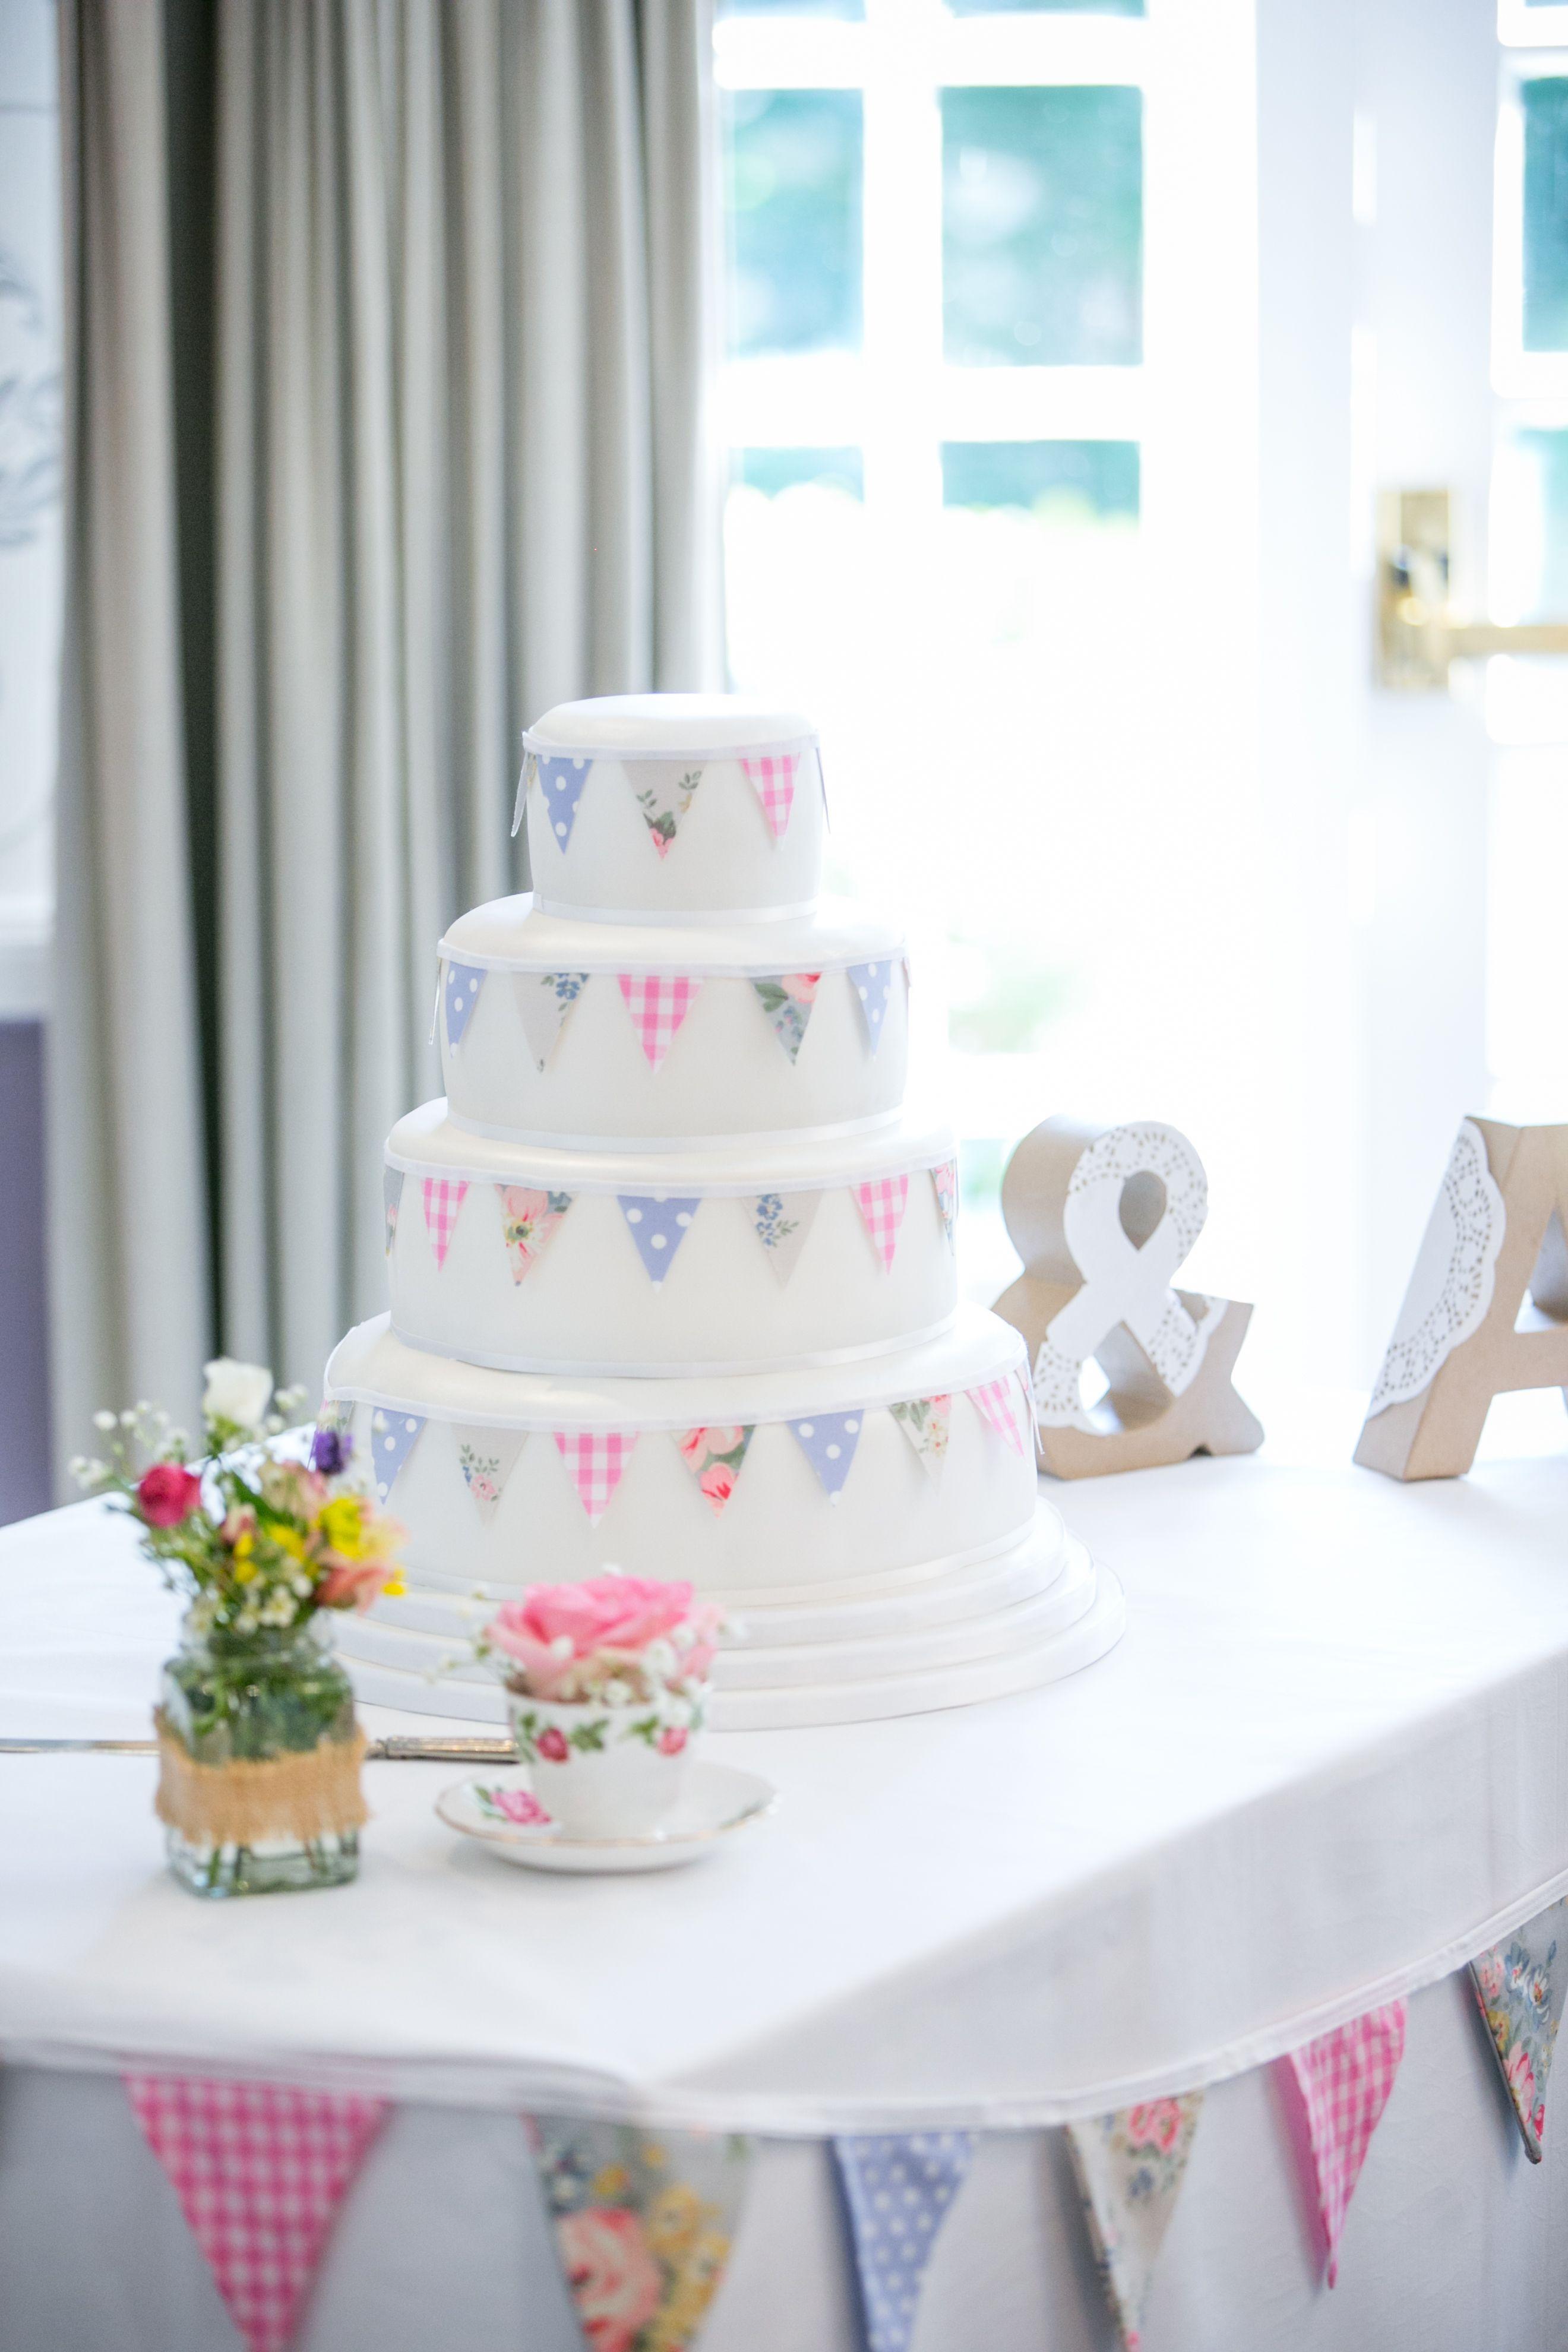 Cath Kidston bunting cake | Lillian | Pinterest | Cath kidston ...